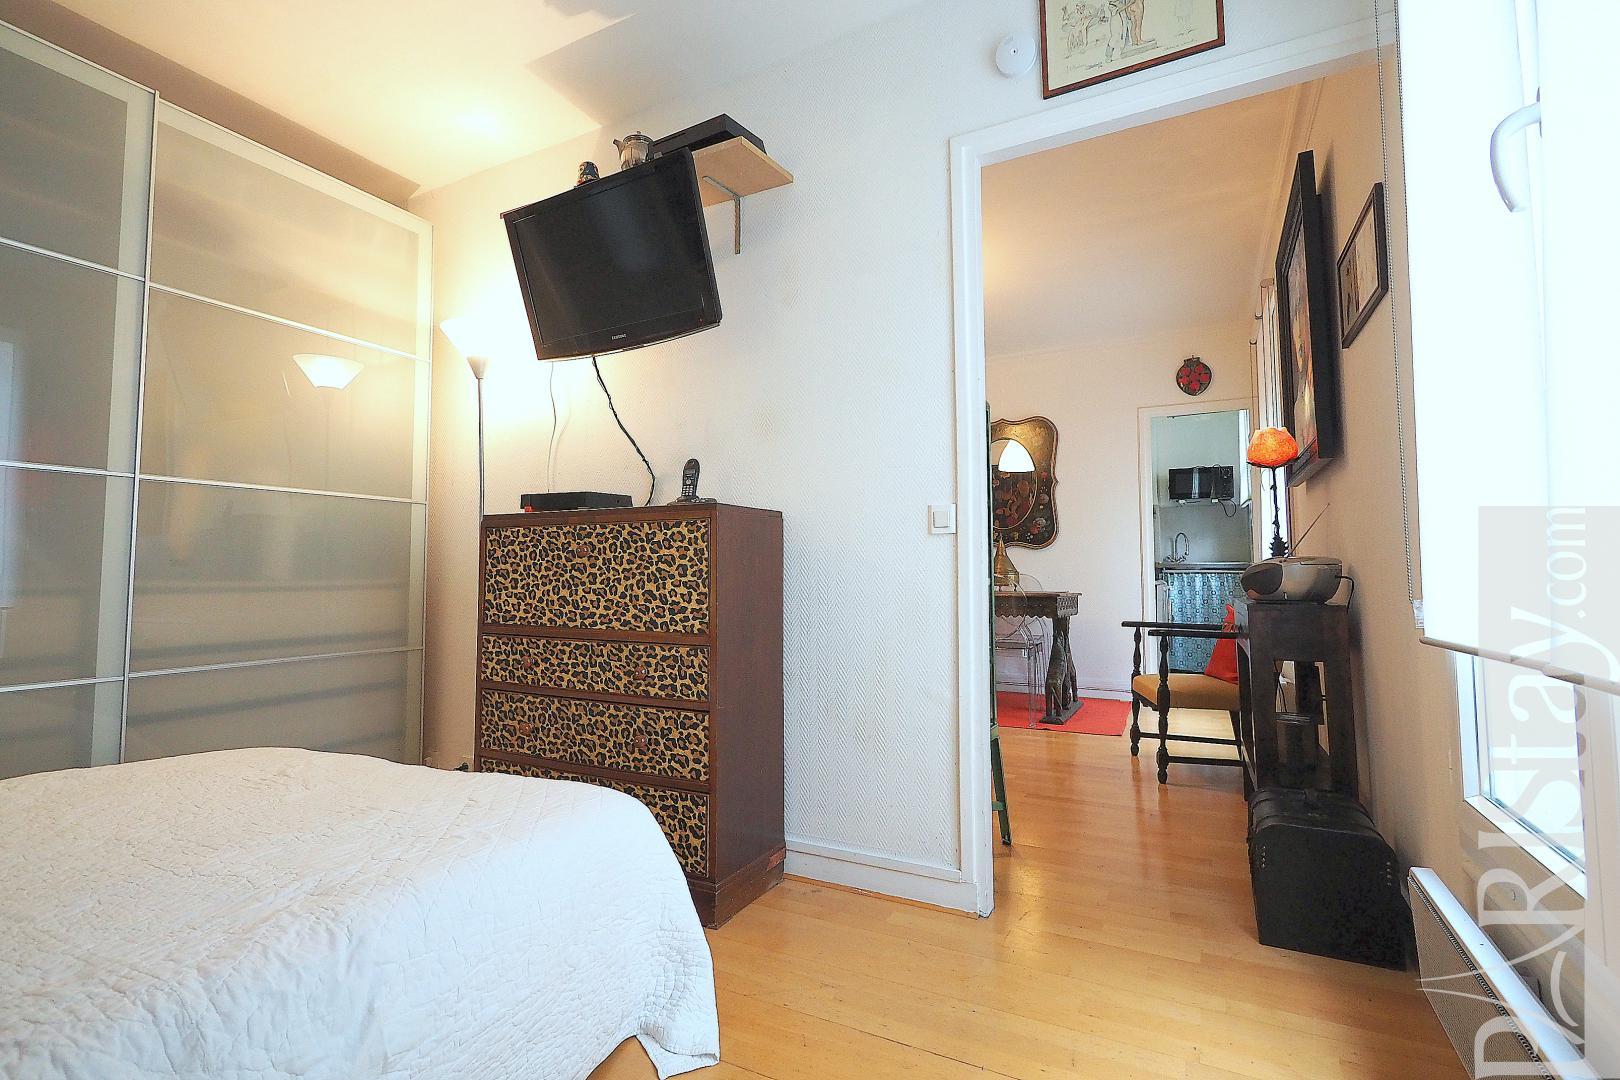 Affordable 1 bedroom apartment for rent Parc Monceau 75017 ...